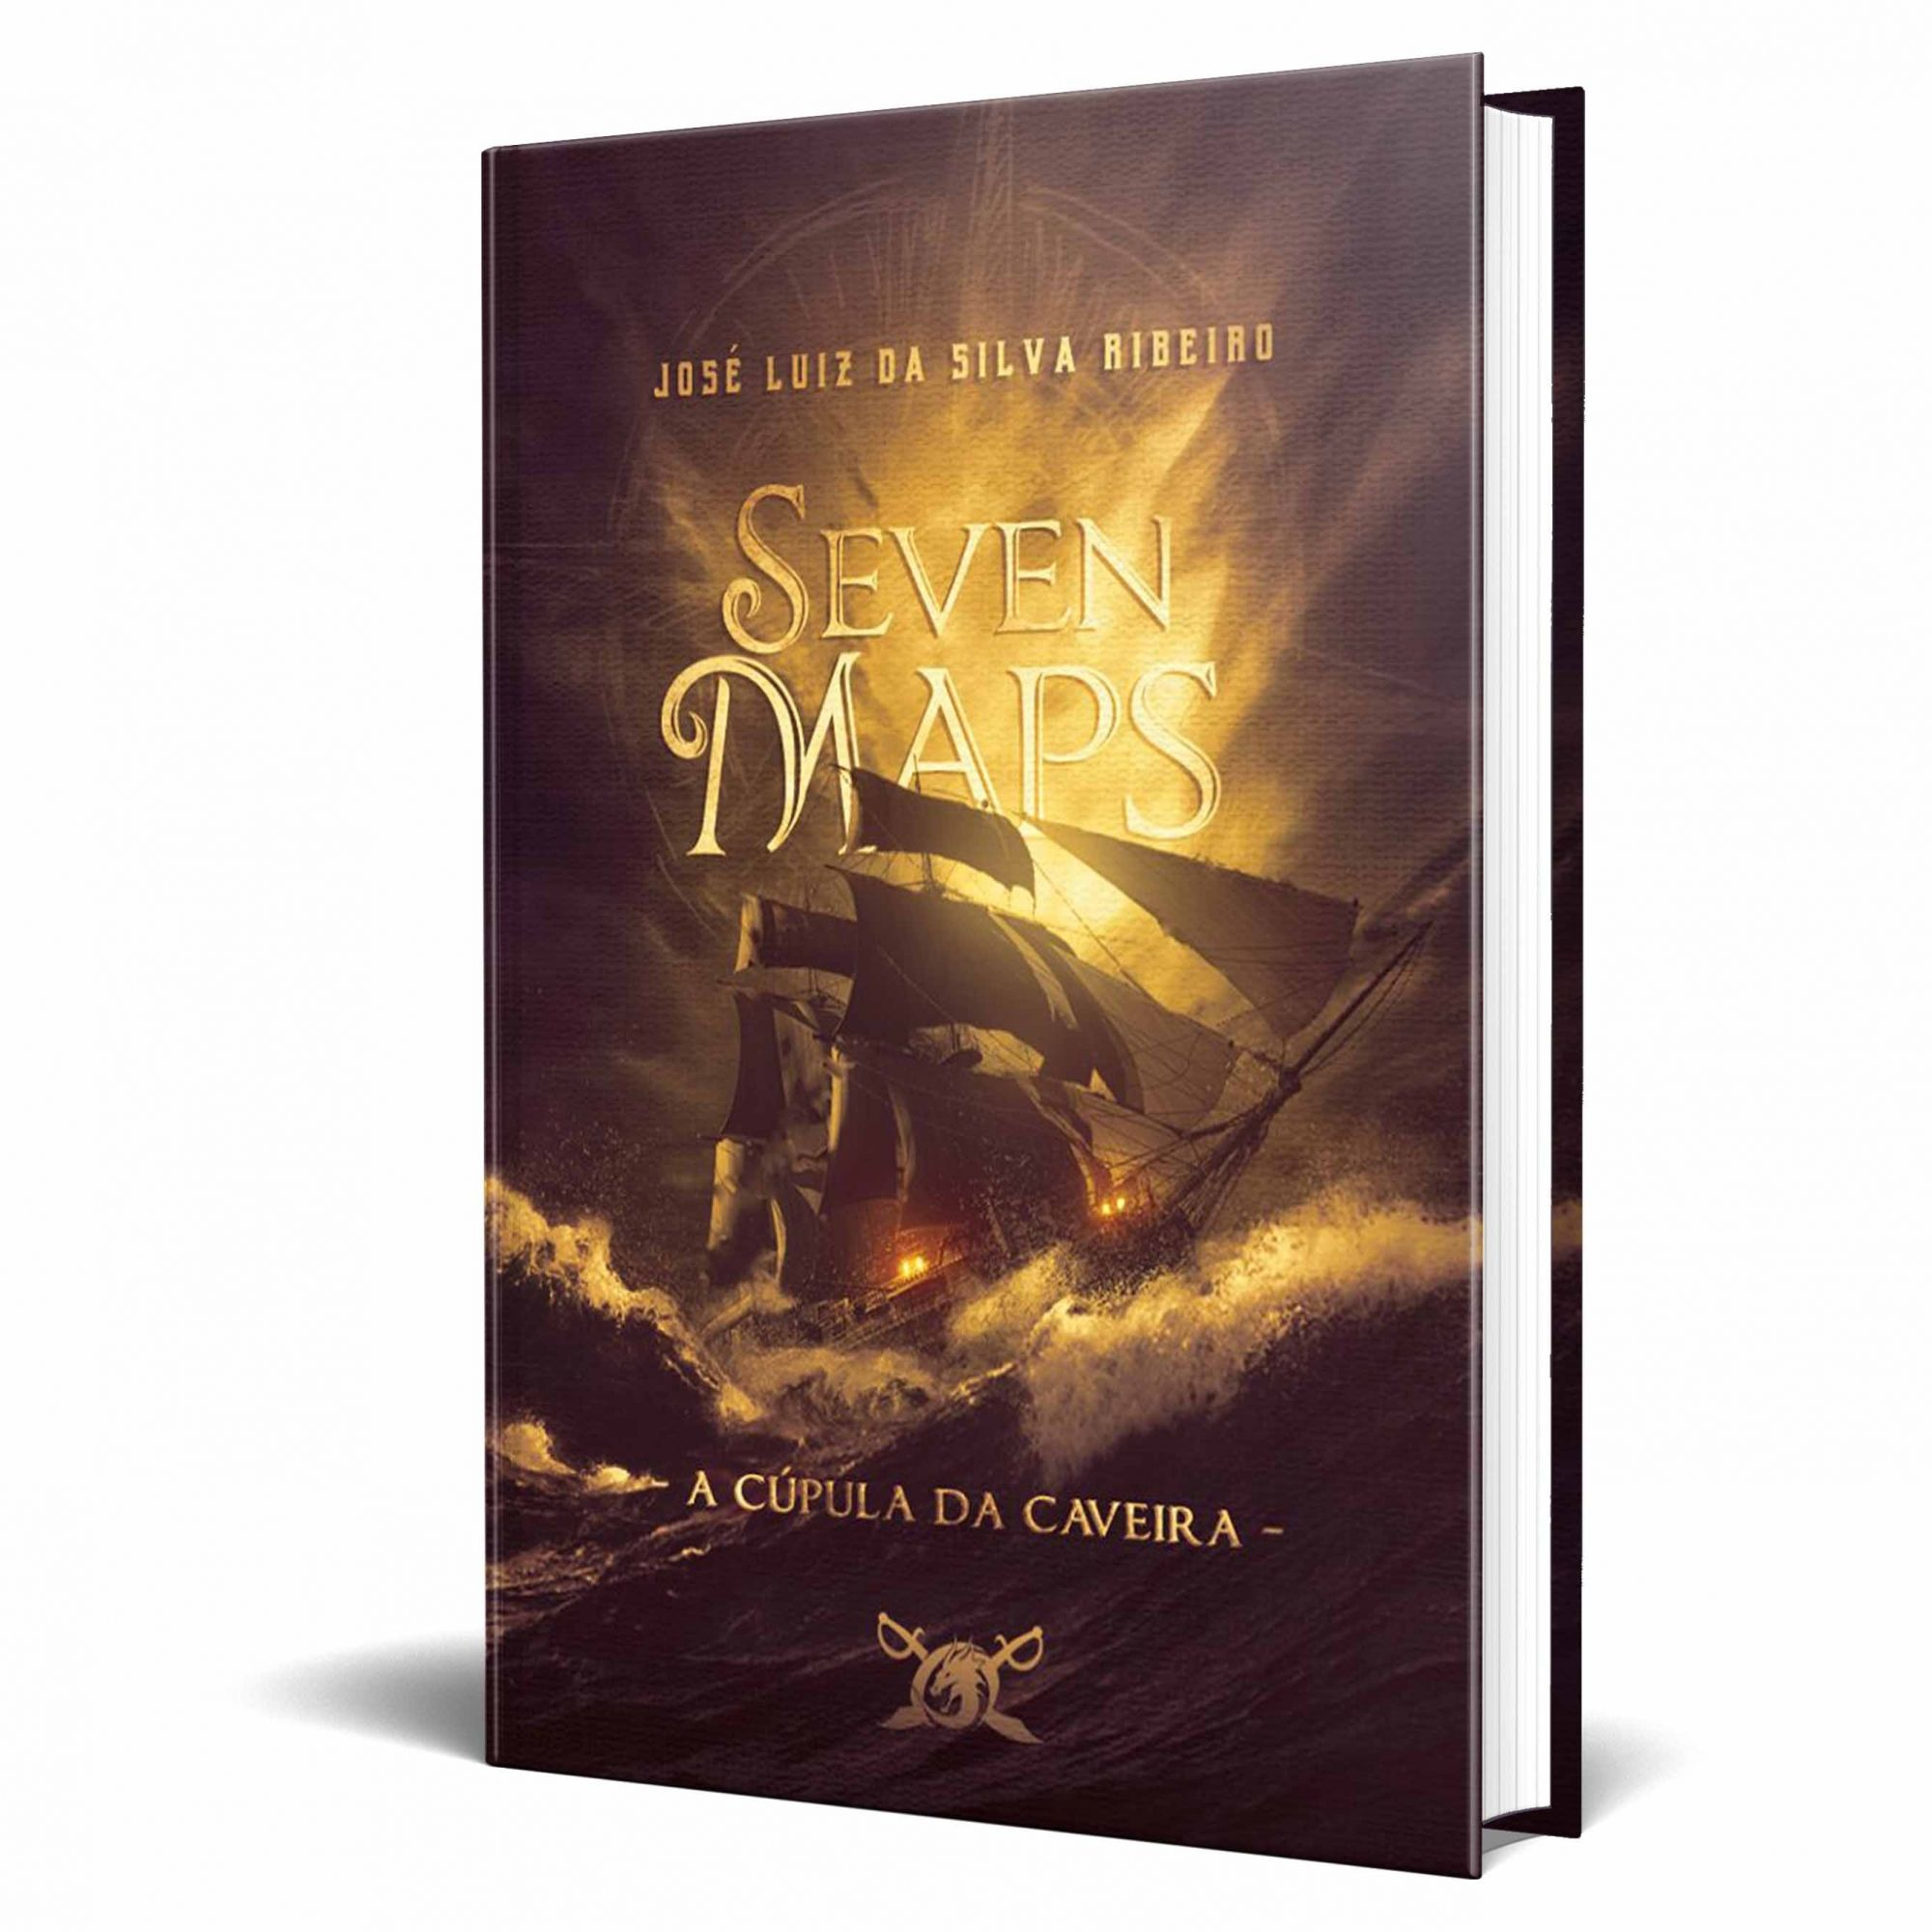 Livro Seven Maps - A Cúpula da Caveira